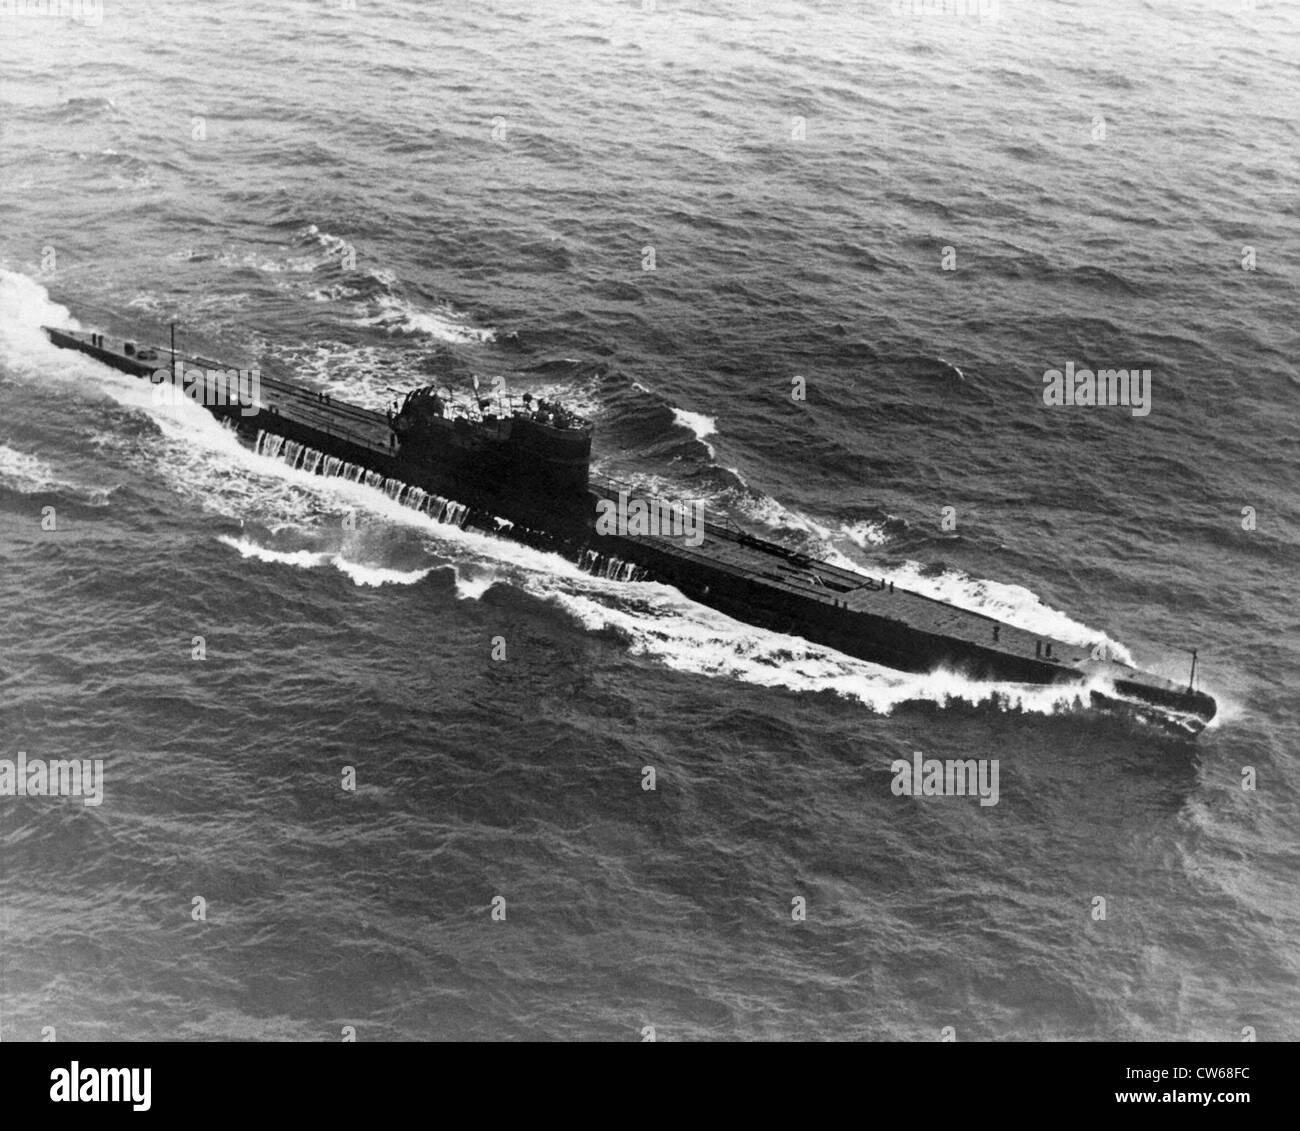 German submarine U-668